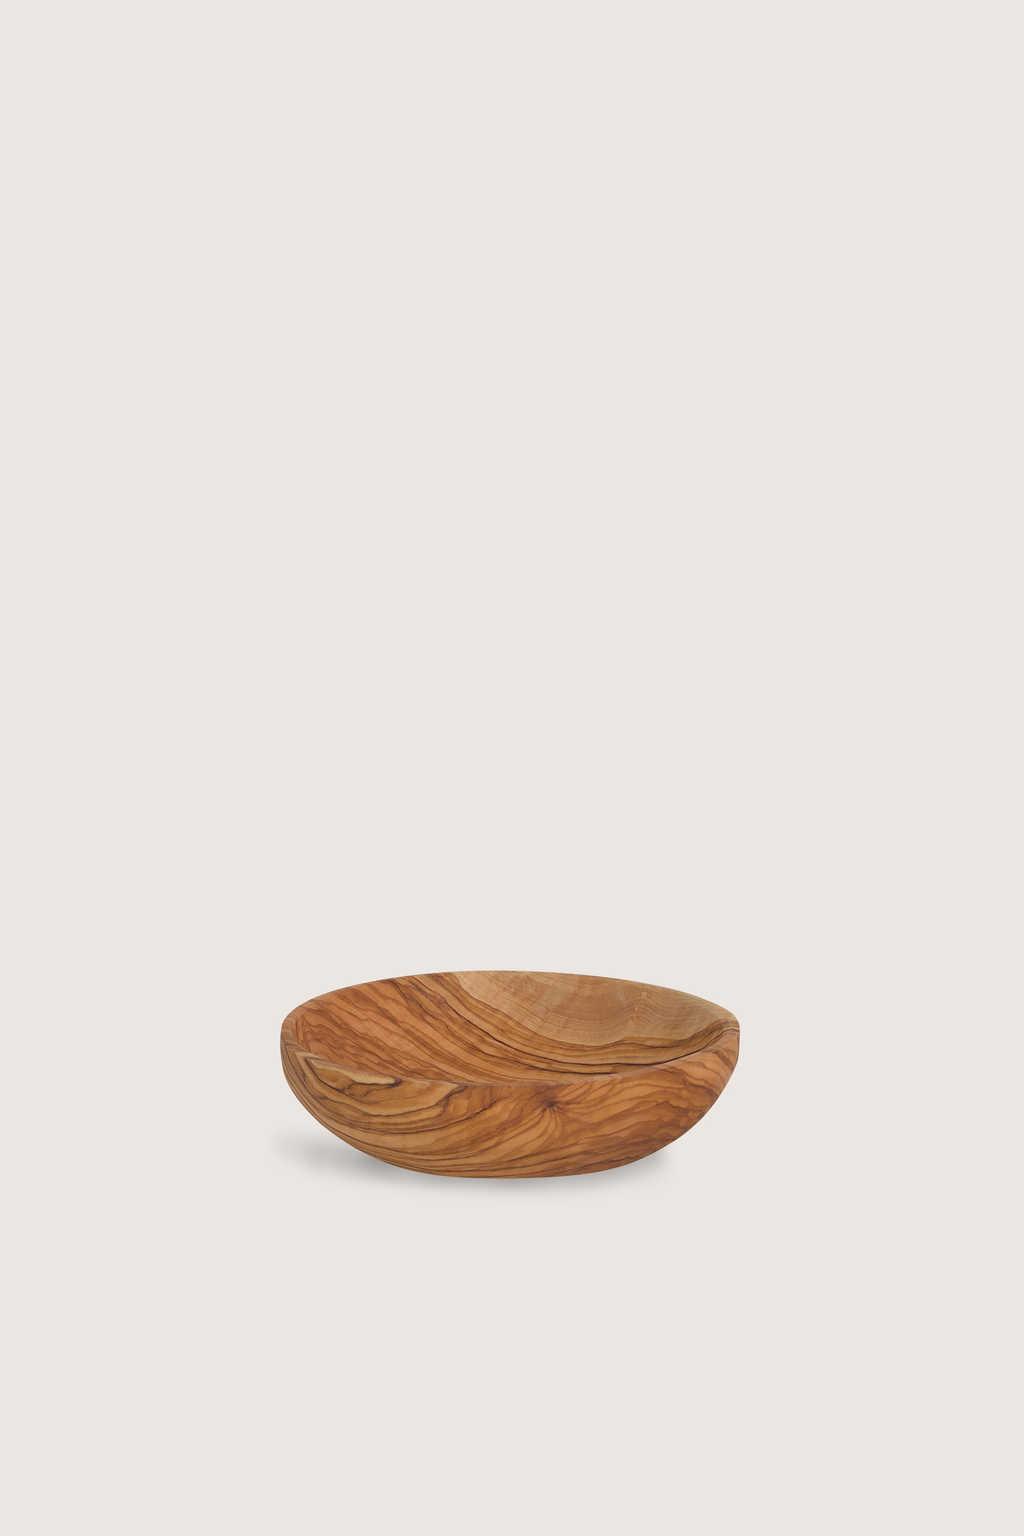 Wood Bowl 2428 Brown 2